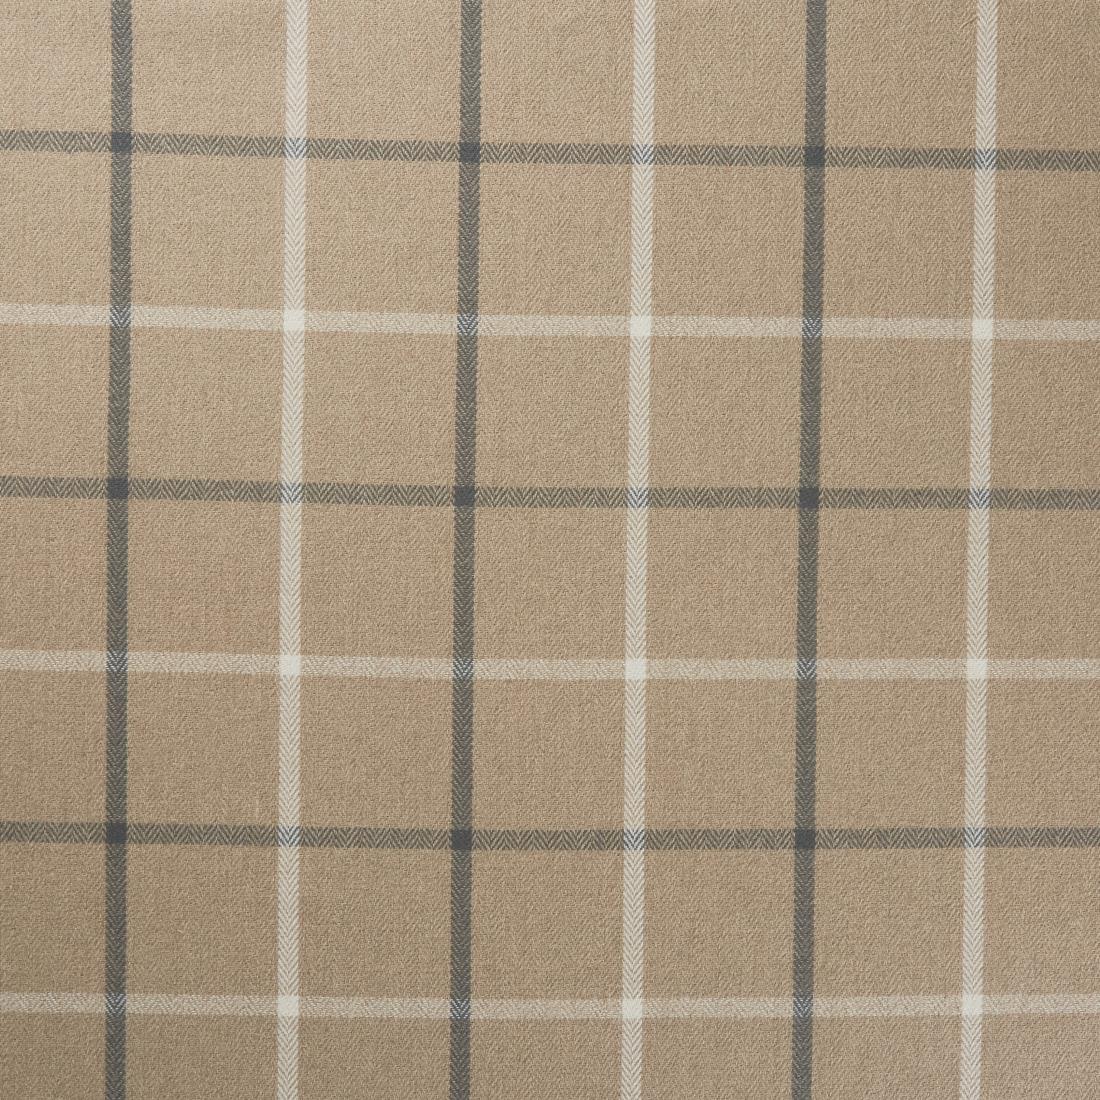 Mull Latte Upholstery Fabric